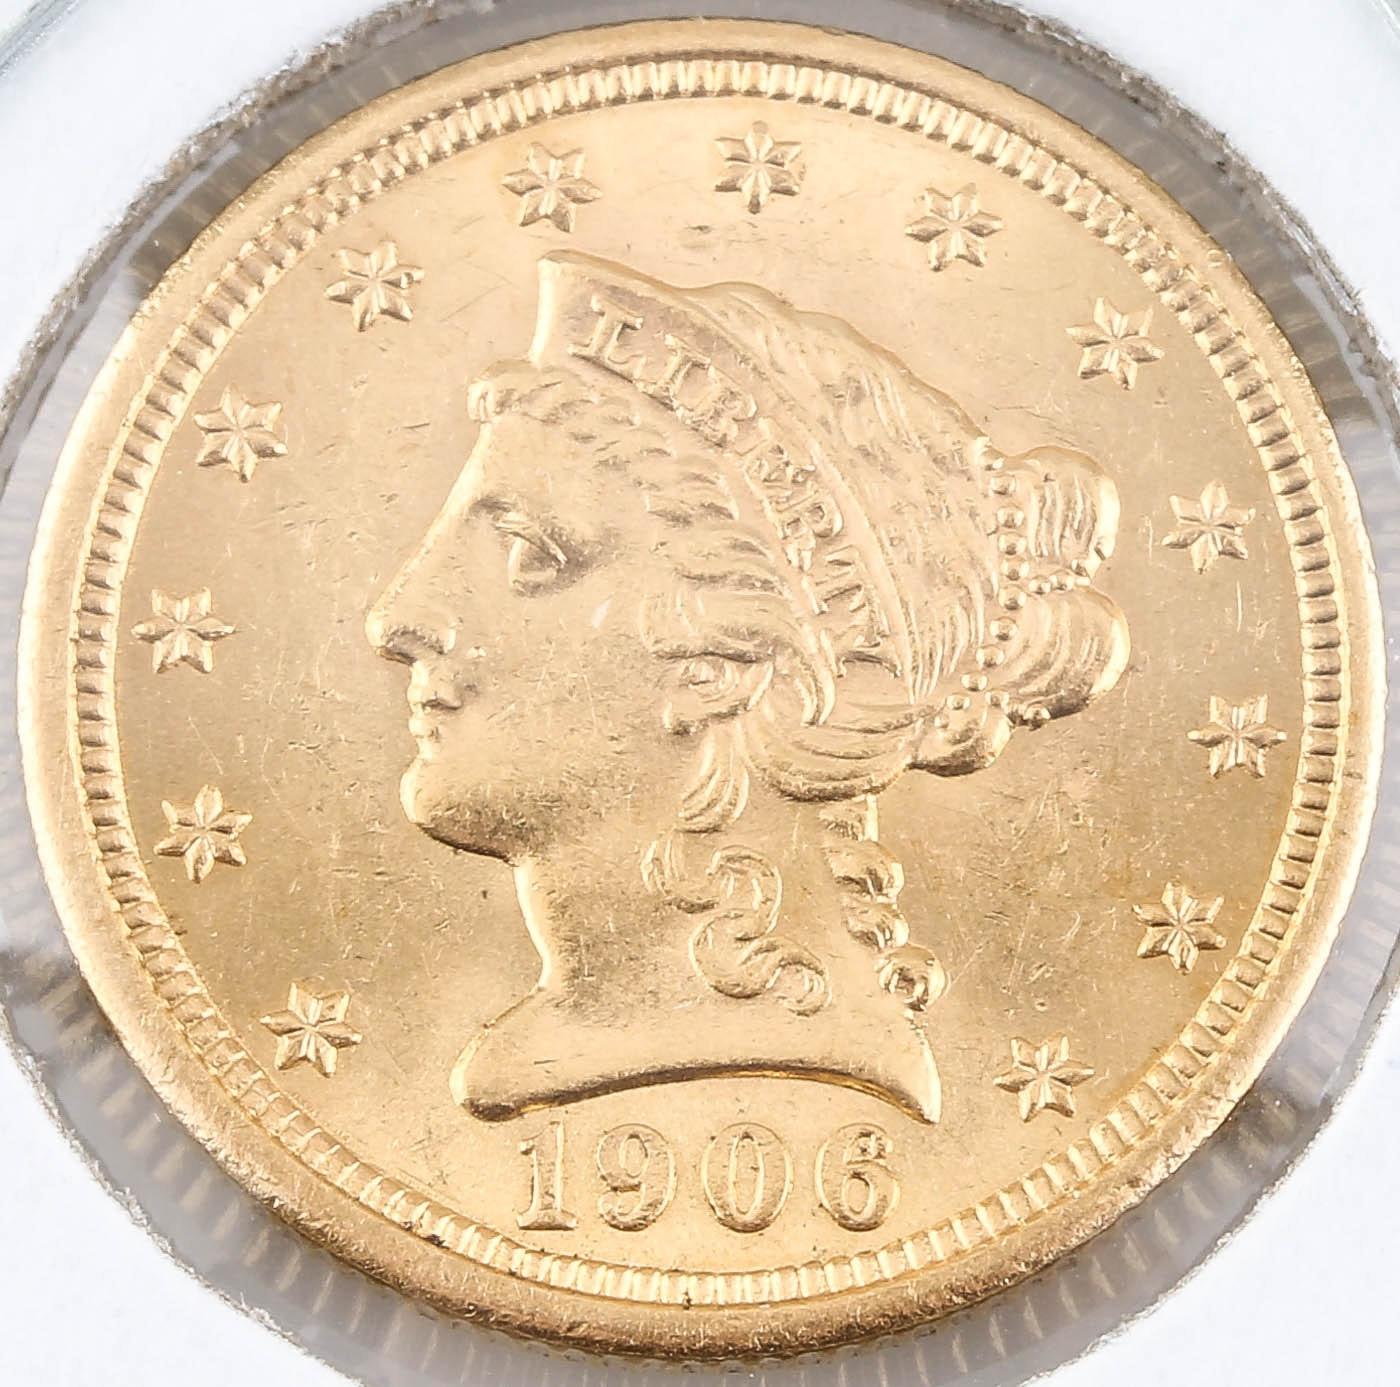 1906 Liberty Head $2 1/2 Gold Coin